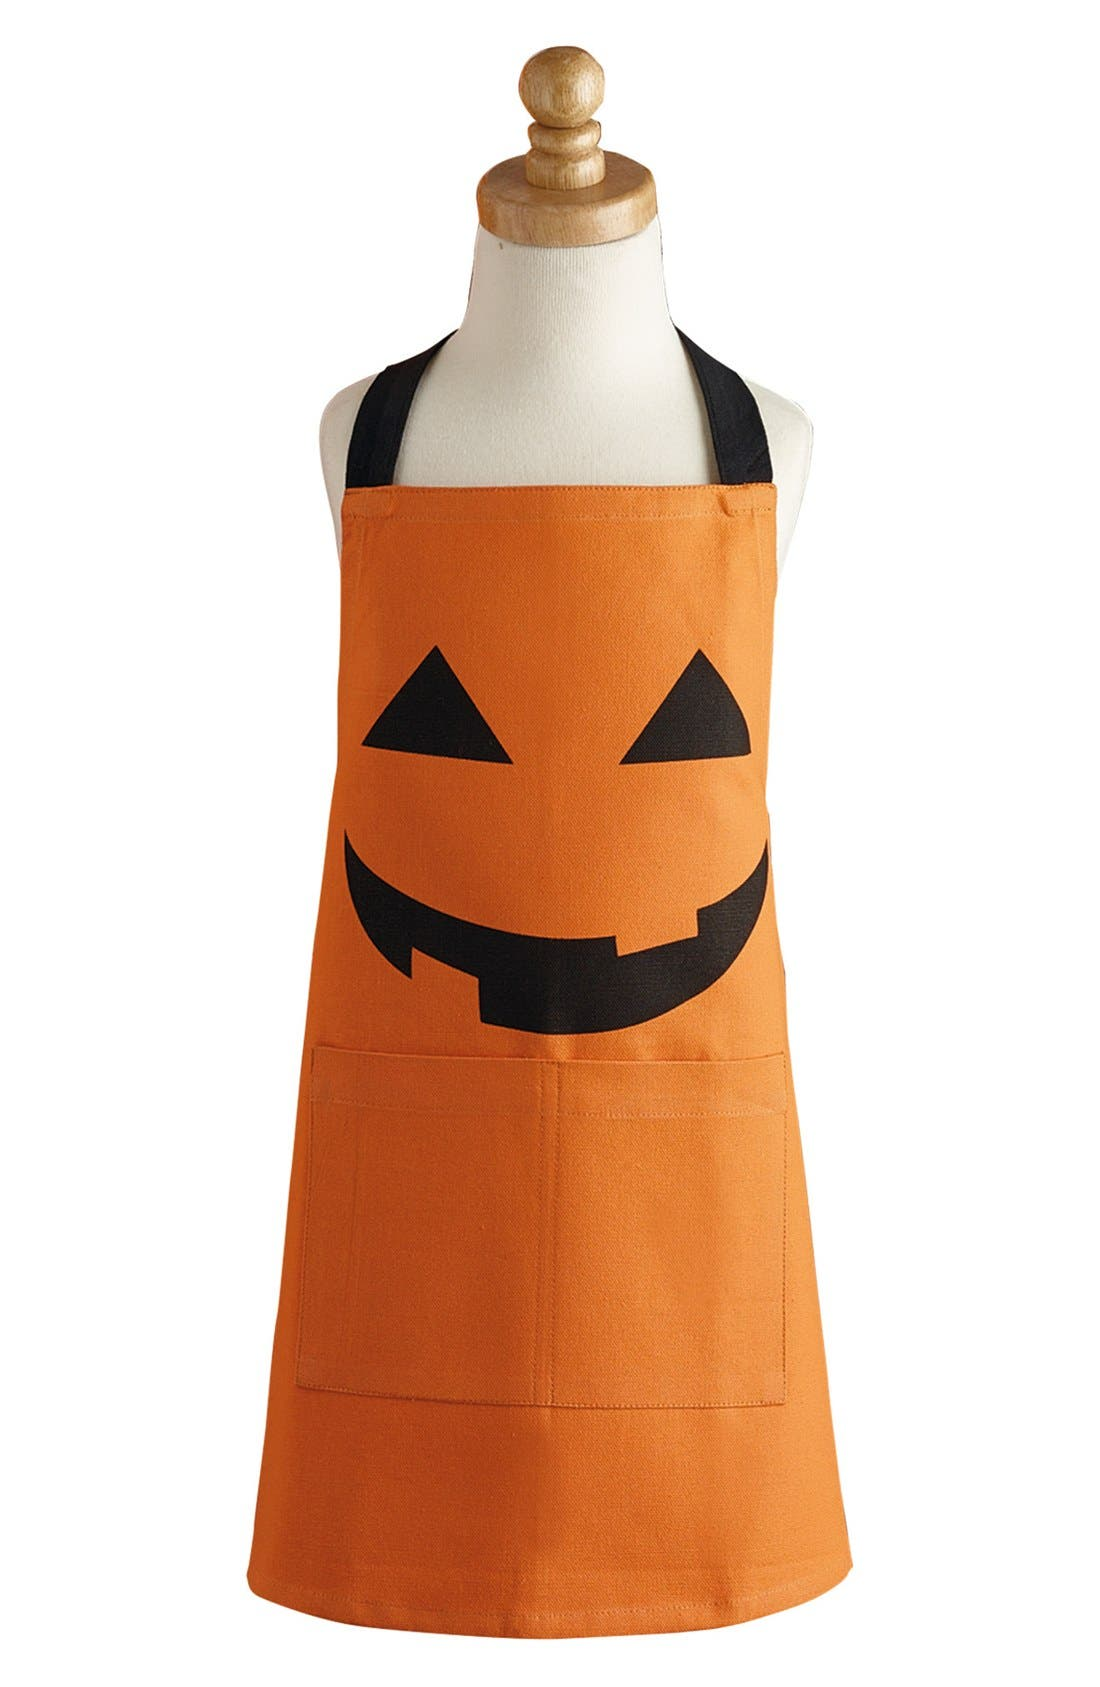 Alternate Image 1 Selected - Design Imports Halloween Apron (Kids)